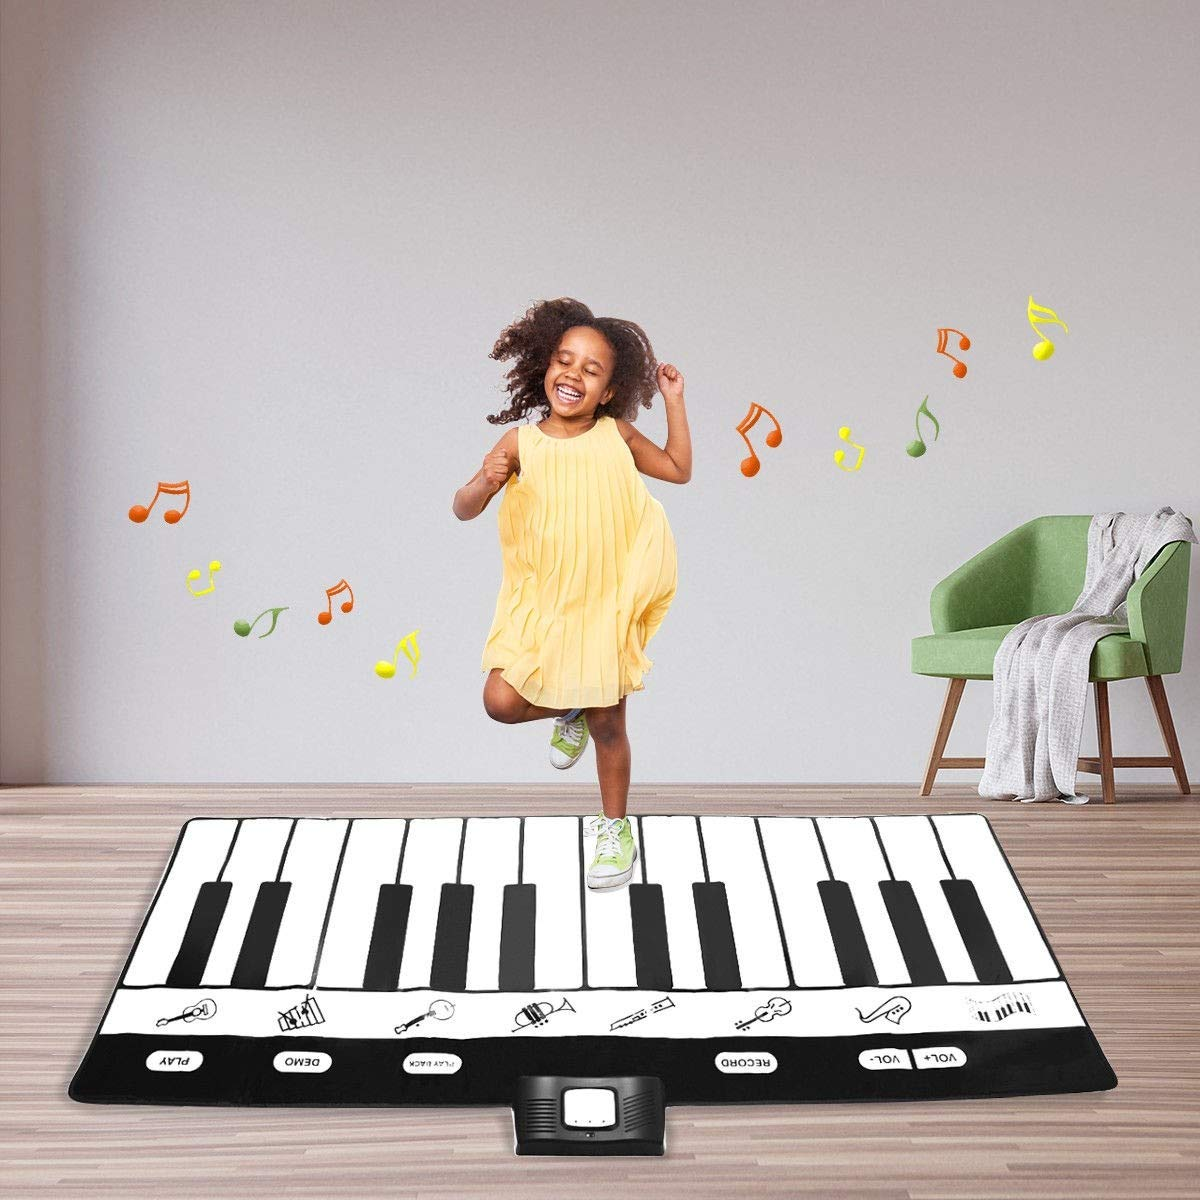 Dayanaprincess New Kids 24 Key Gigantic Piano Keyboard with 8 Instrument Settings Learning Children Play Set Fun Entertaining Book Melody by Dayanaprincess (Image #3)